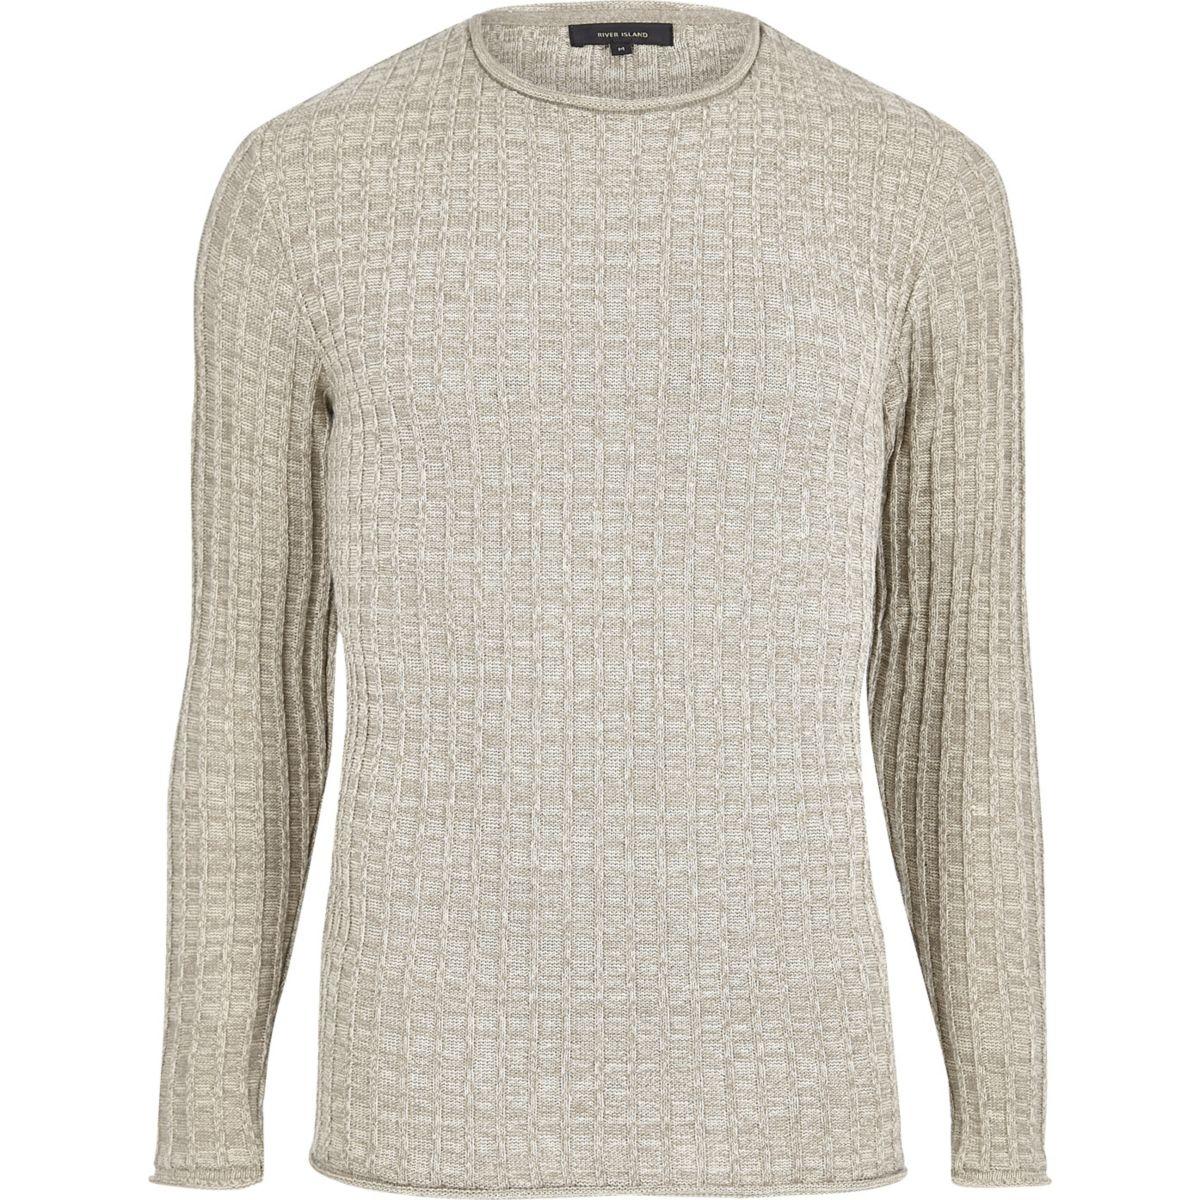 Stone ribbed crew neck sweater